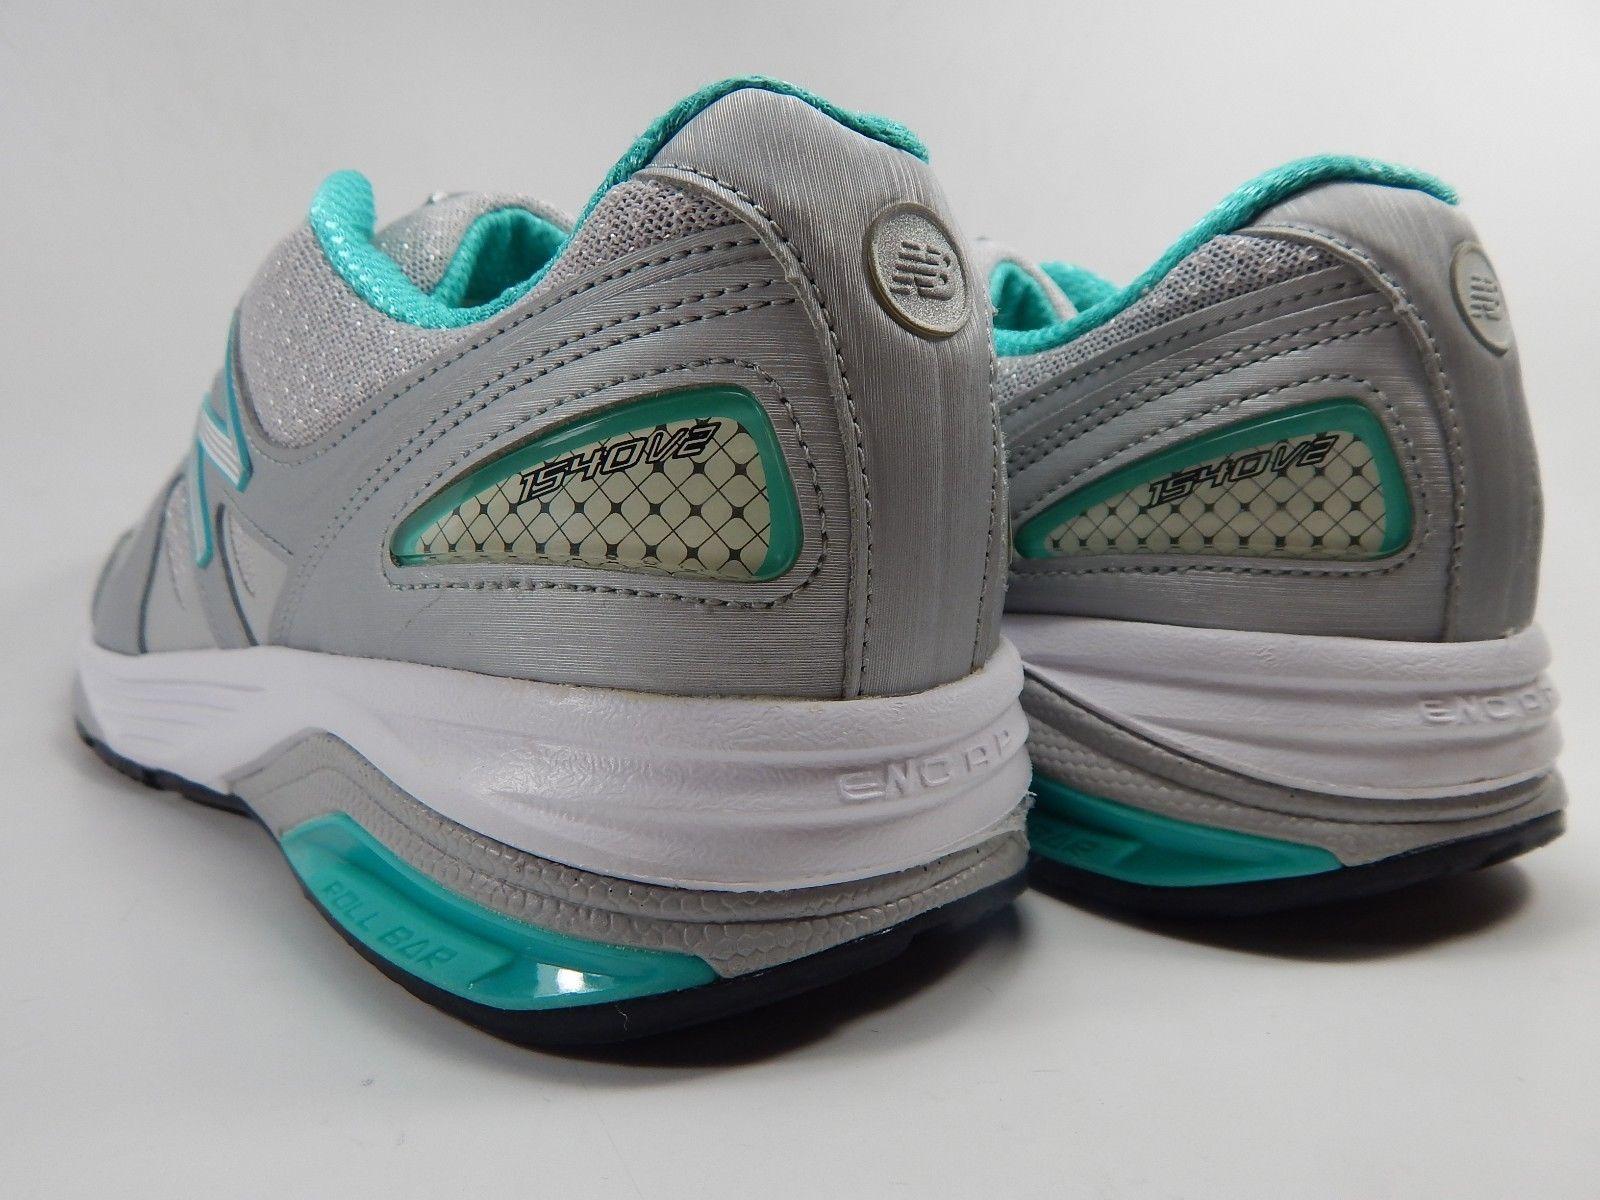 New Balance 1540 v2 Women's Running Shoes Size US 10.5 D WIDE EU 42.5 W1540SG2 image 4